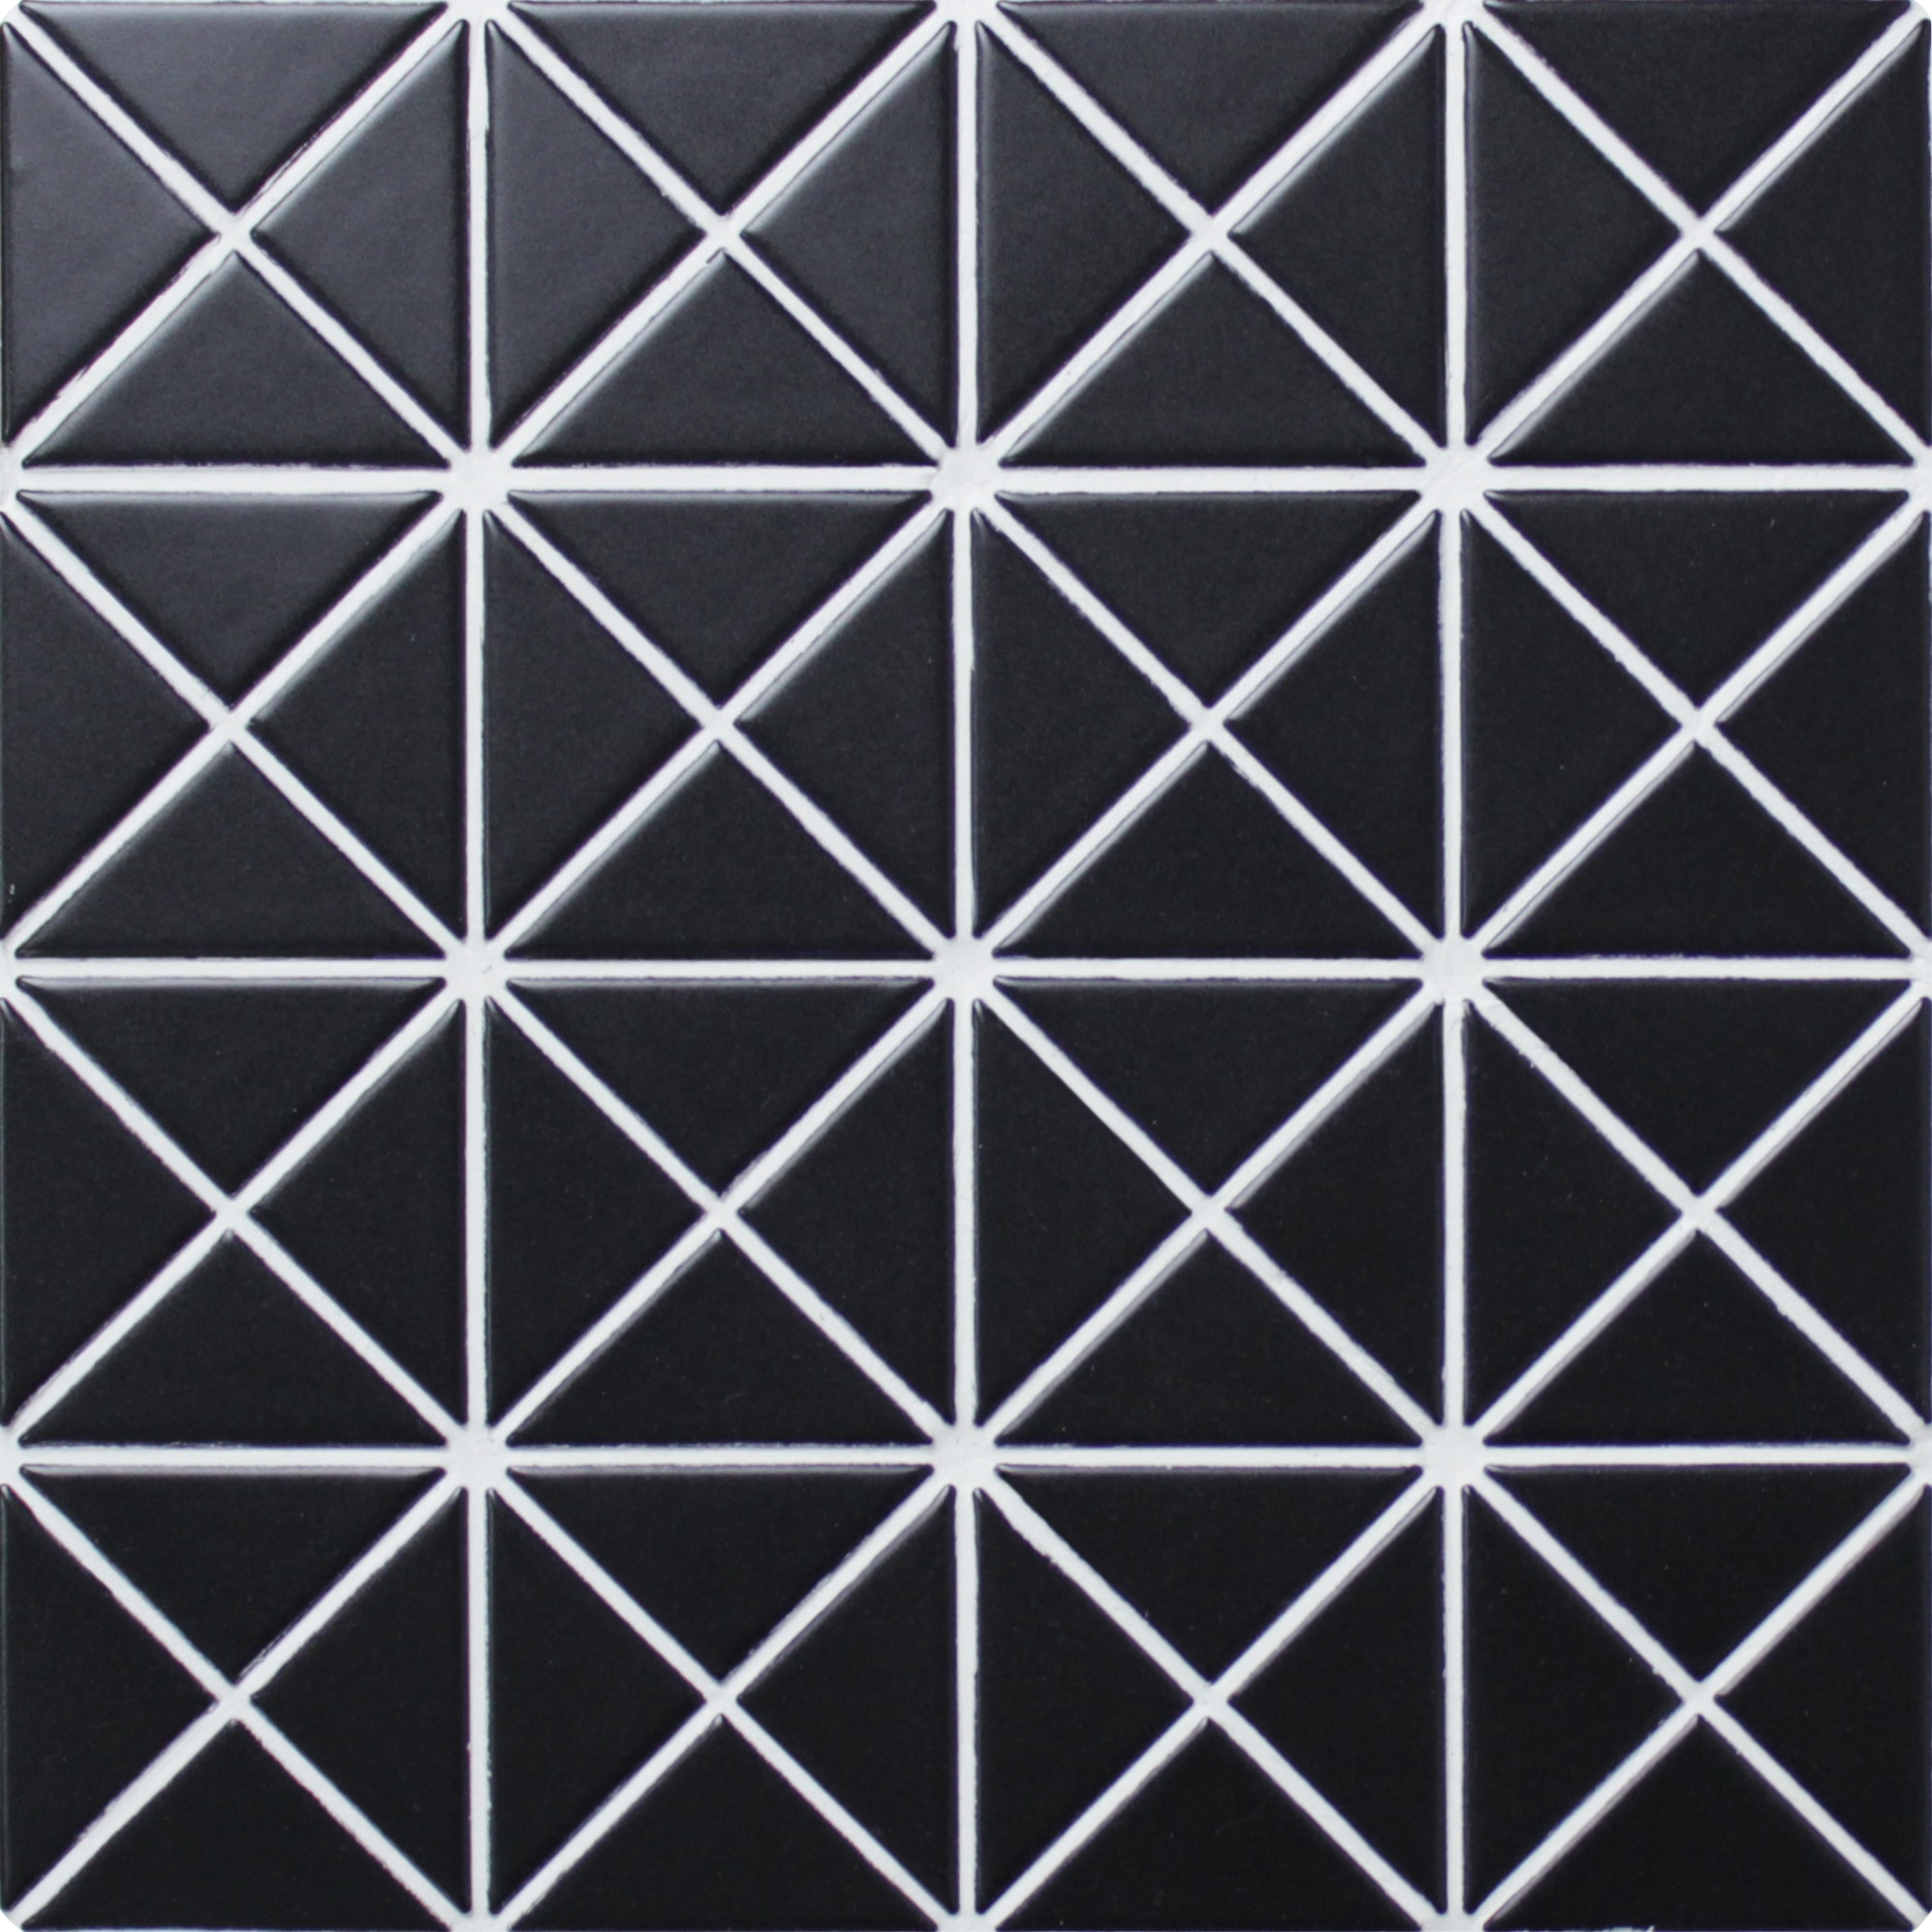 "Triangular Pure Black / 2-1/3""x1-2/3"" / Matte Triangle Porcelain Mosaic Tile 0"